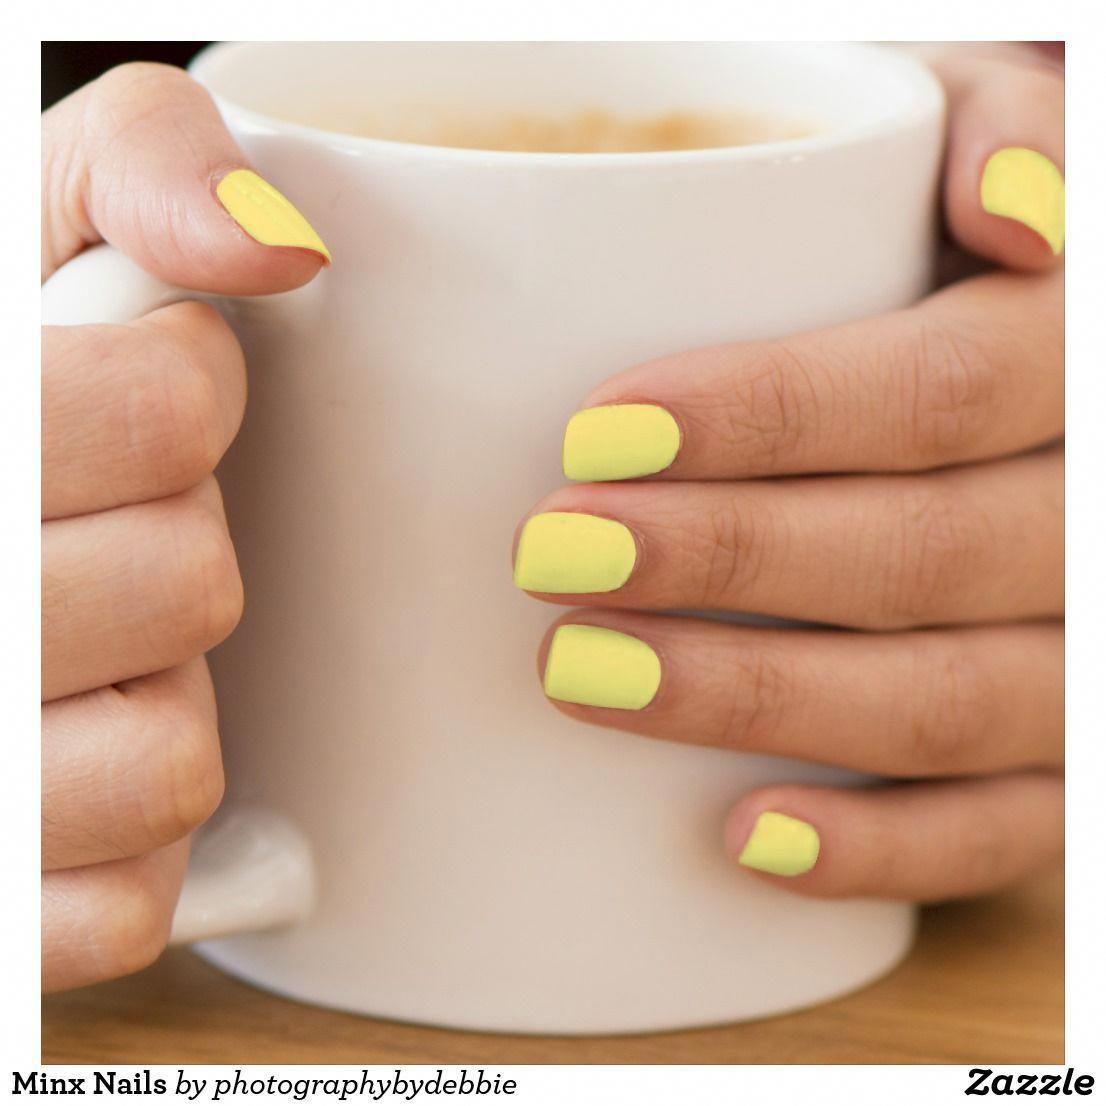 Minx Nails Minx Nail Wraps | Zazzle.com